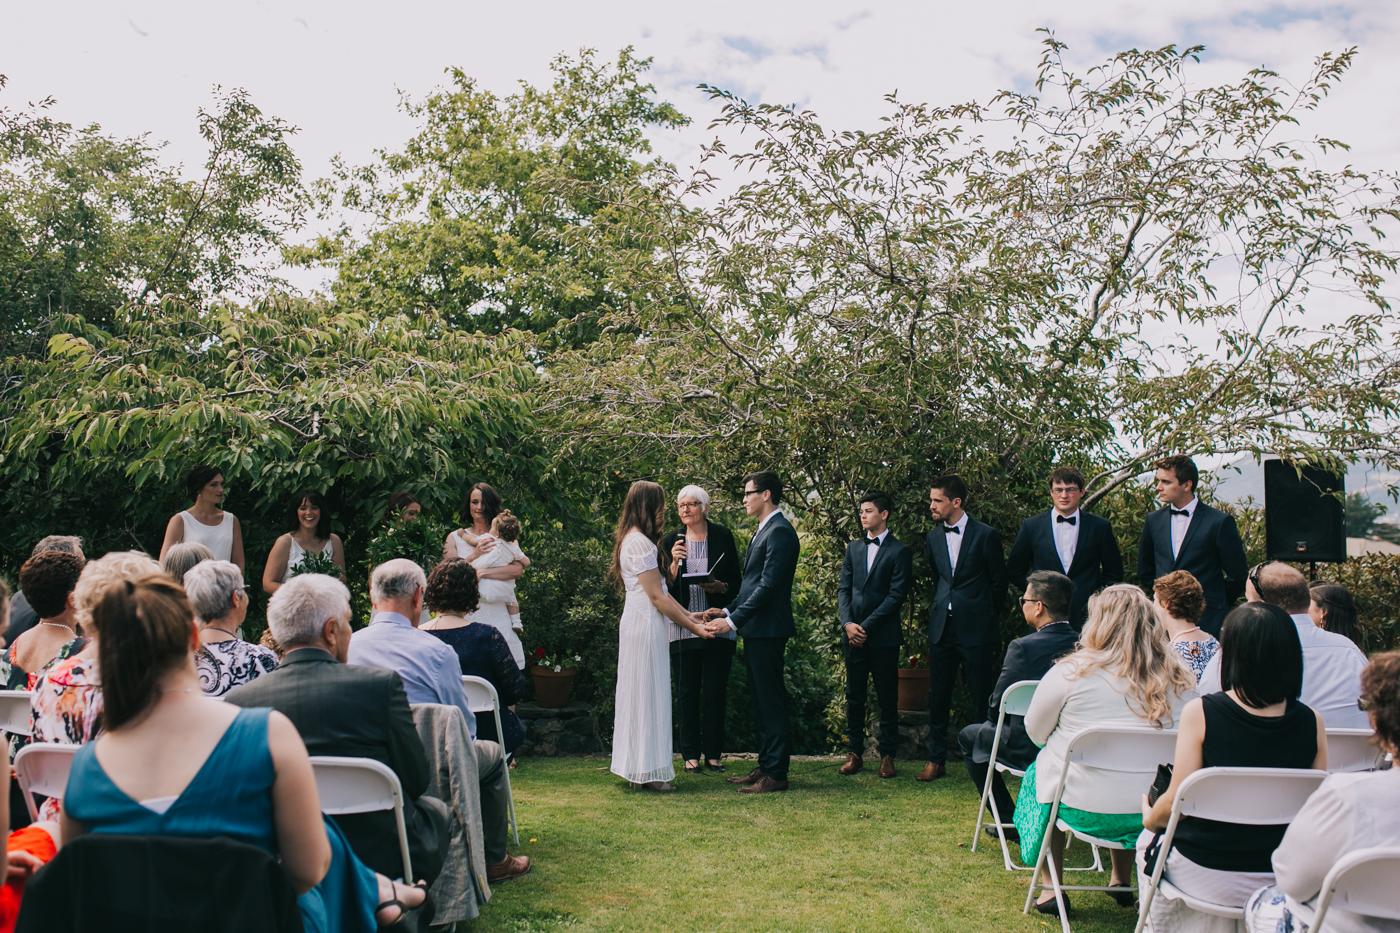 Ariana & Tim - Dunedin, New Zealand Wedding - Destination Wedding - Samantha Heather Photography-86.jpg